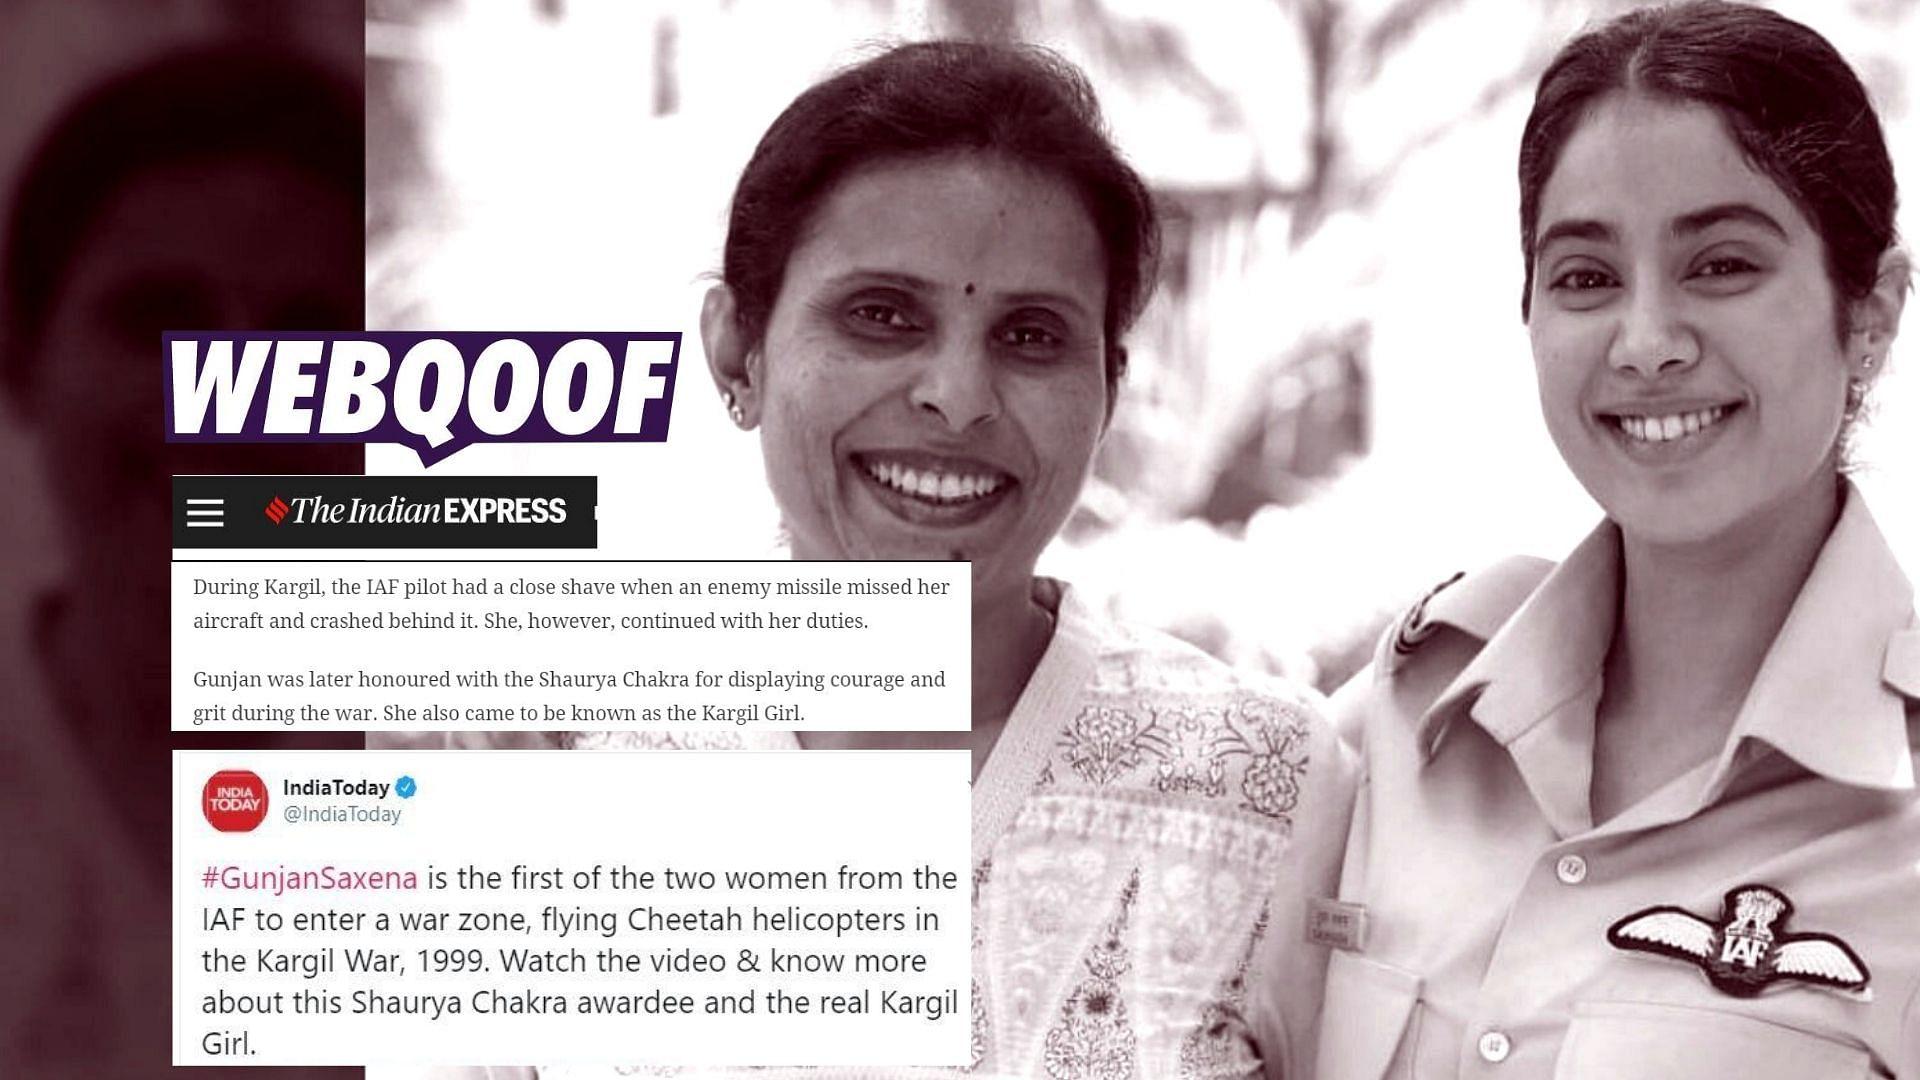 Fact Check Neither Did Gunjan Saxena Claim Nor Is She A Shaurya Chakra Awardee